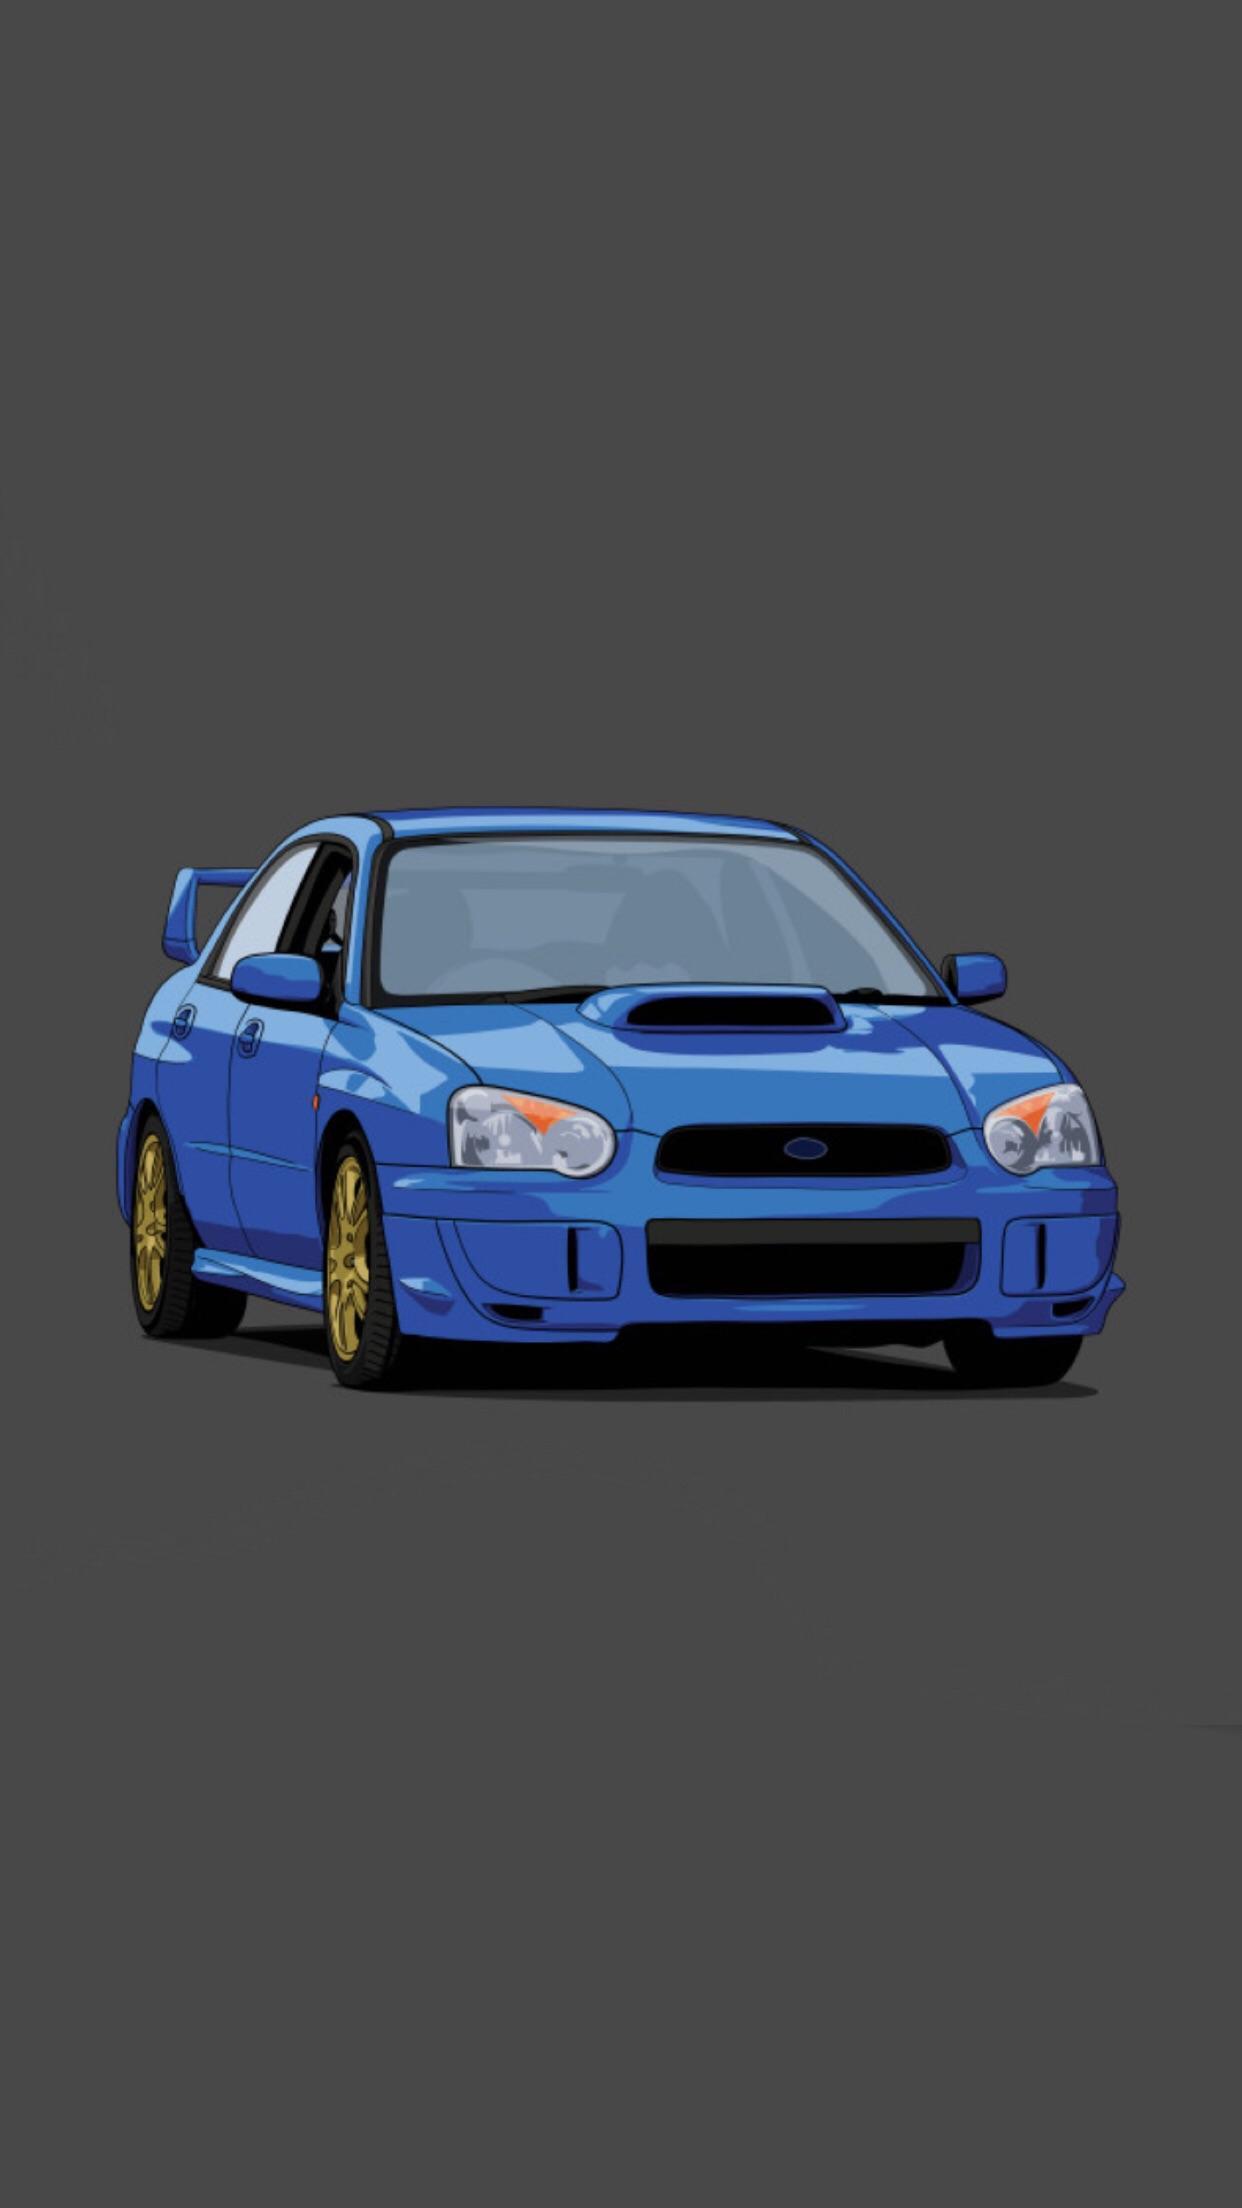 Blobeye Subaru Wallpapers Top Free Blobeye Subaru